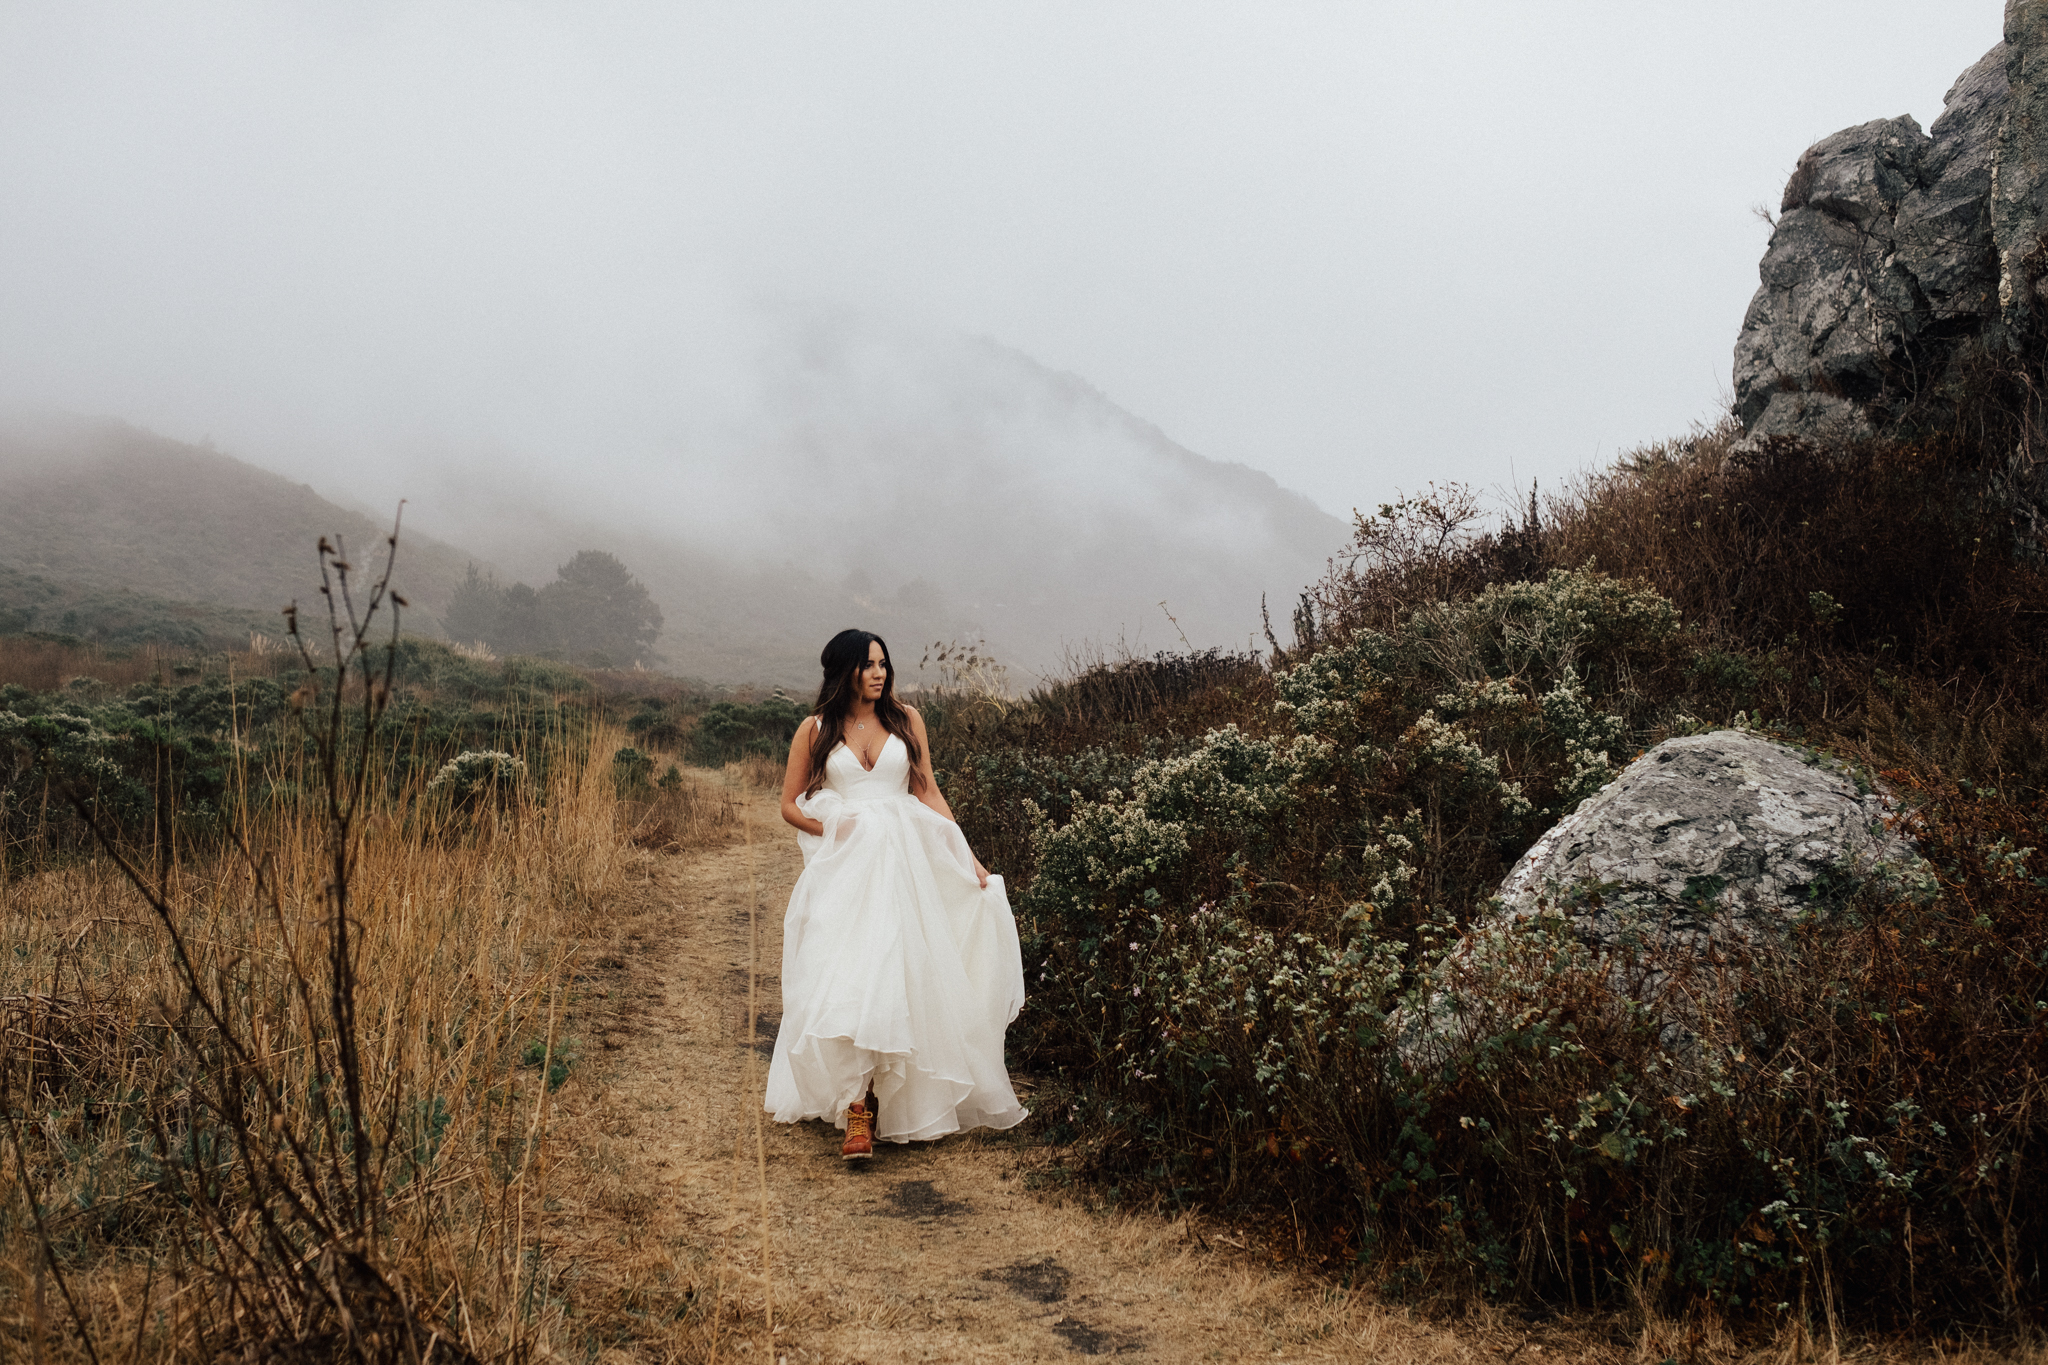 Arizona-Adventure-Elopement-Wedding-Photographer-150.jpg